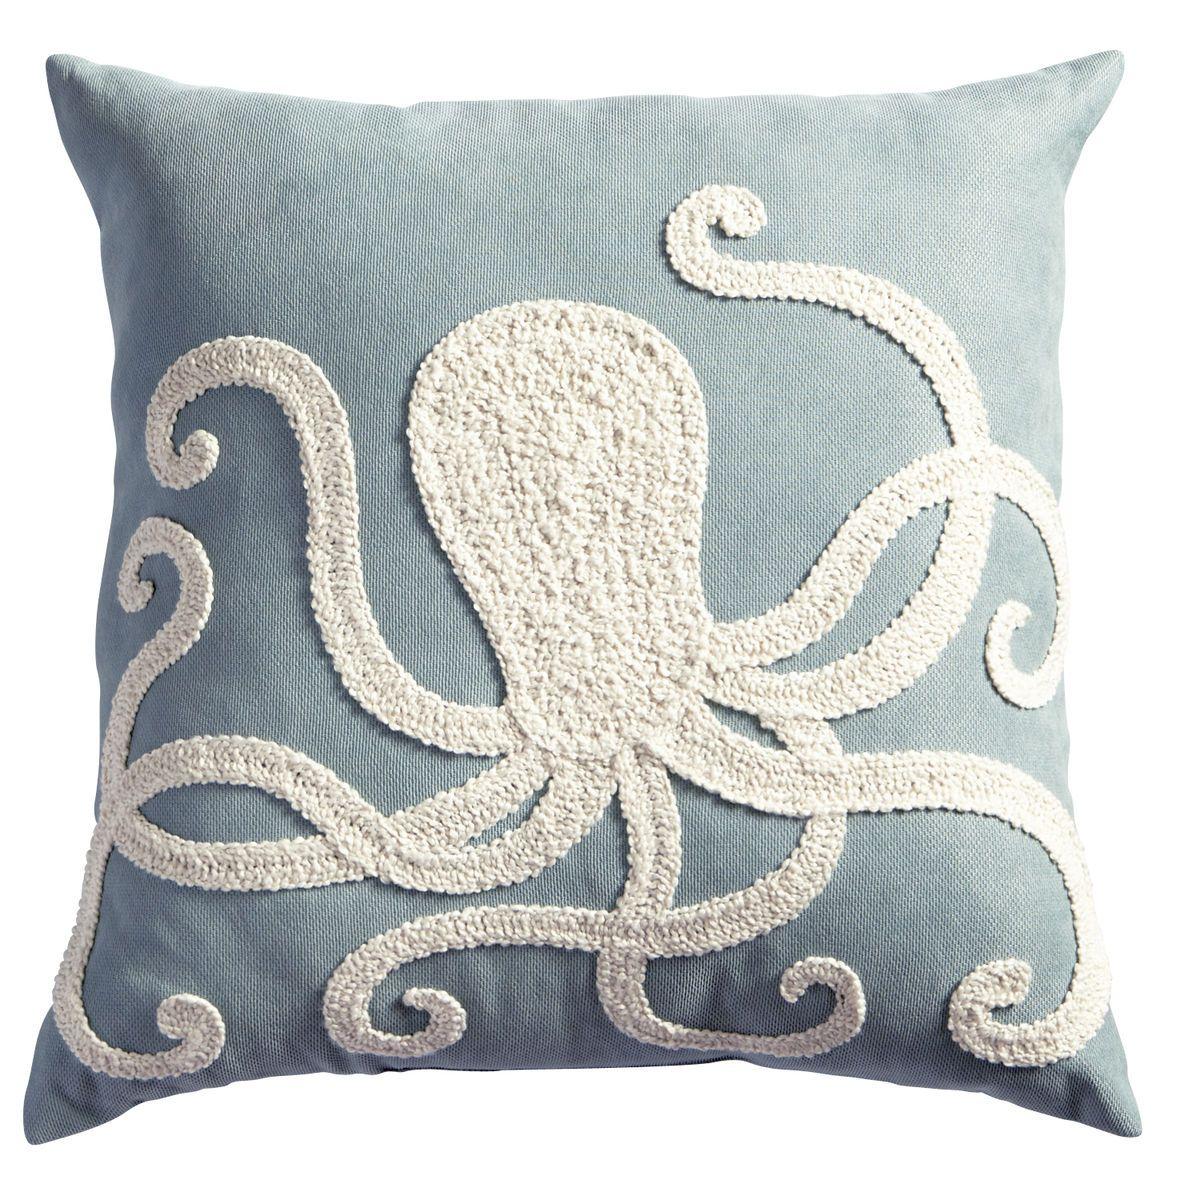 Octopus Embroidered Pillow Octopus Pillow Octopus Decor Embroidered Pillow